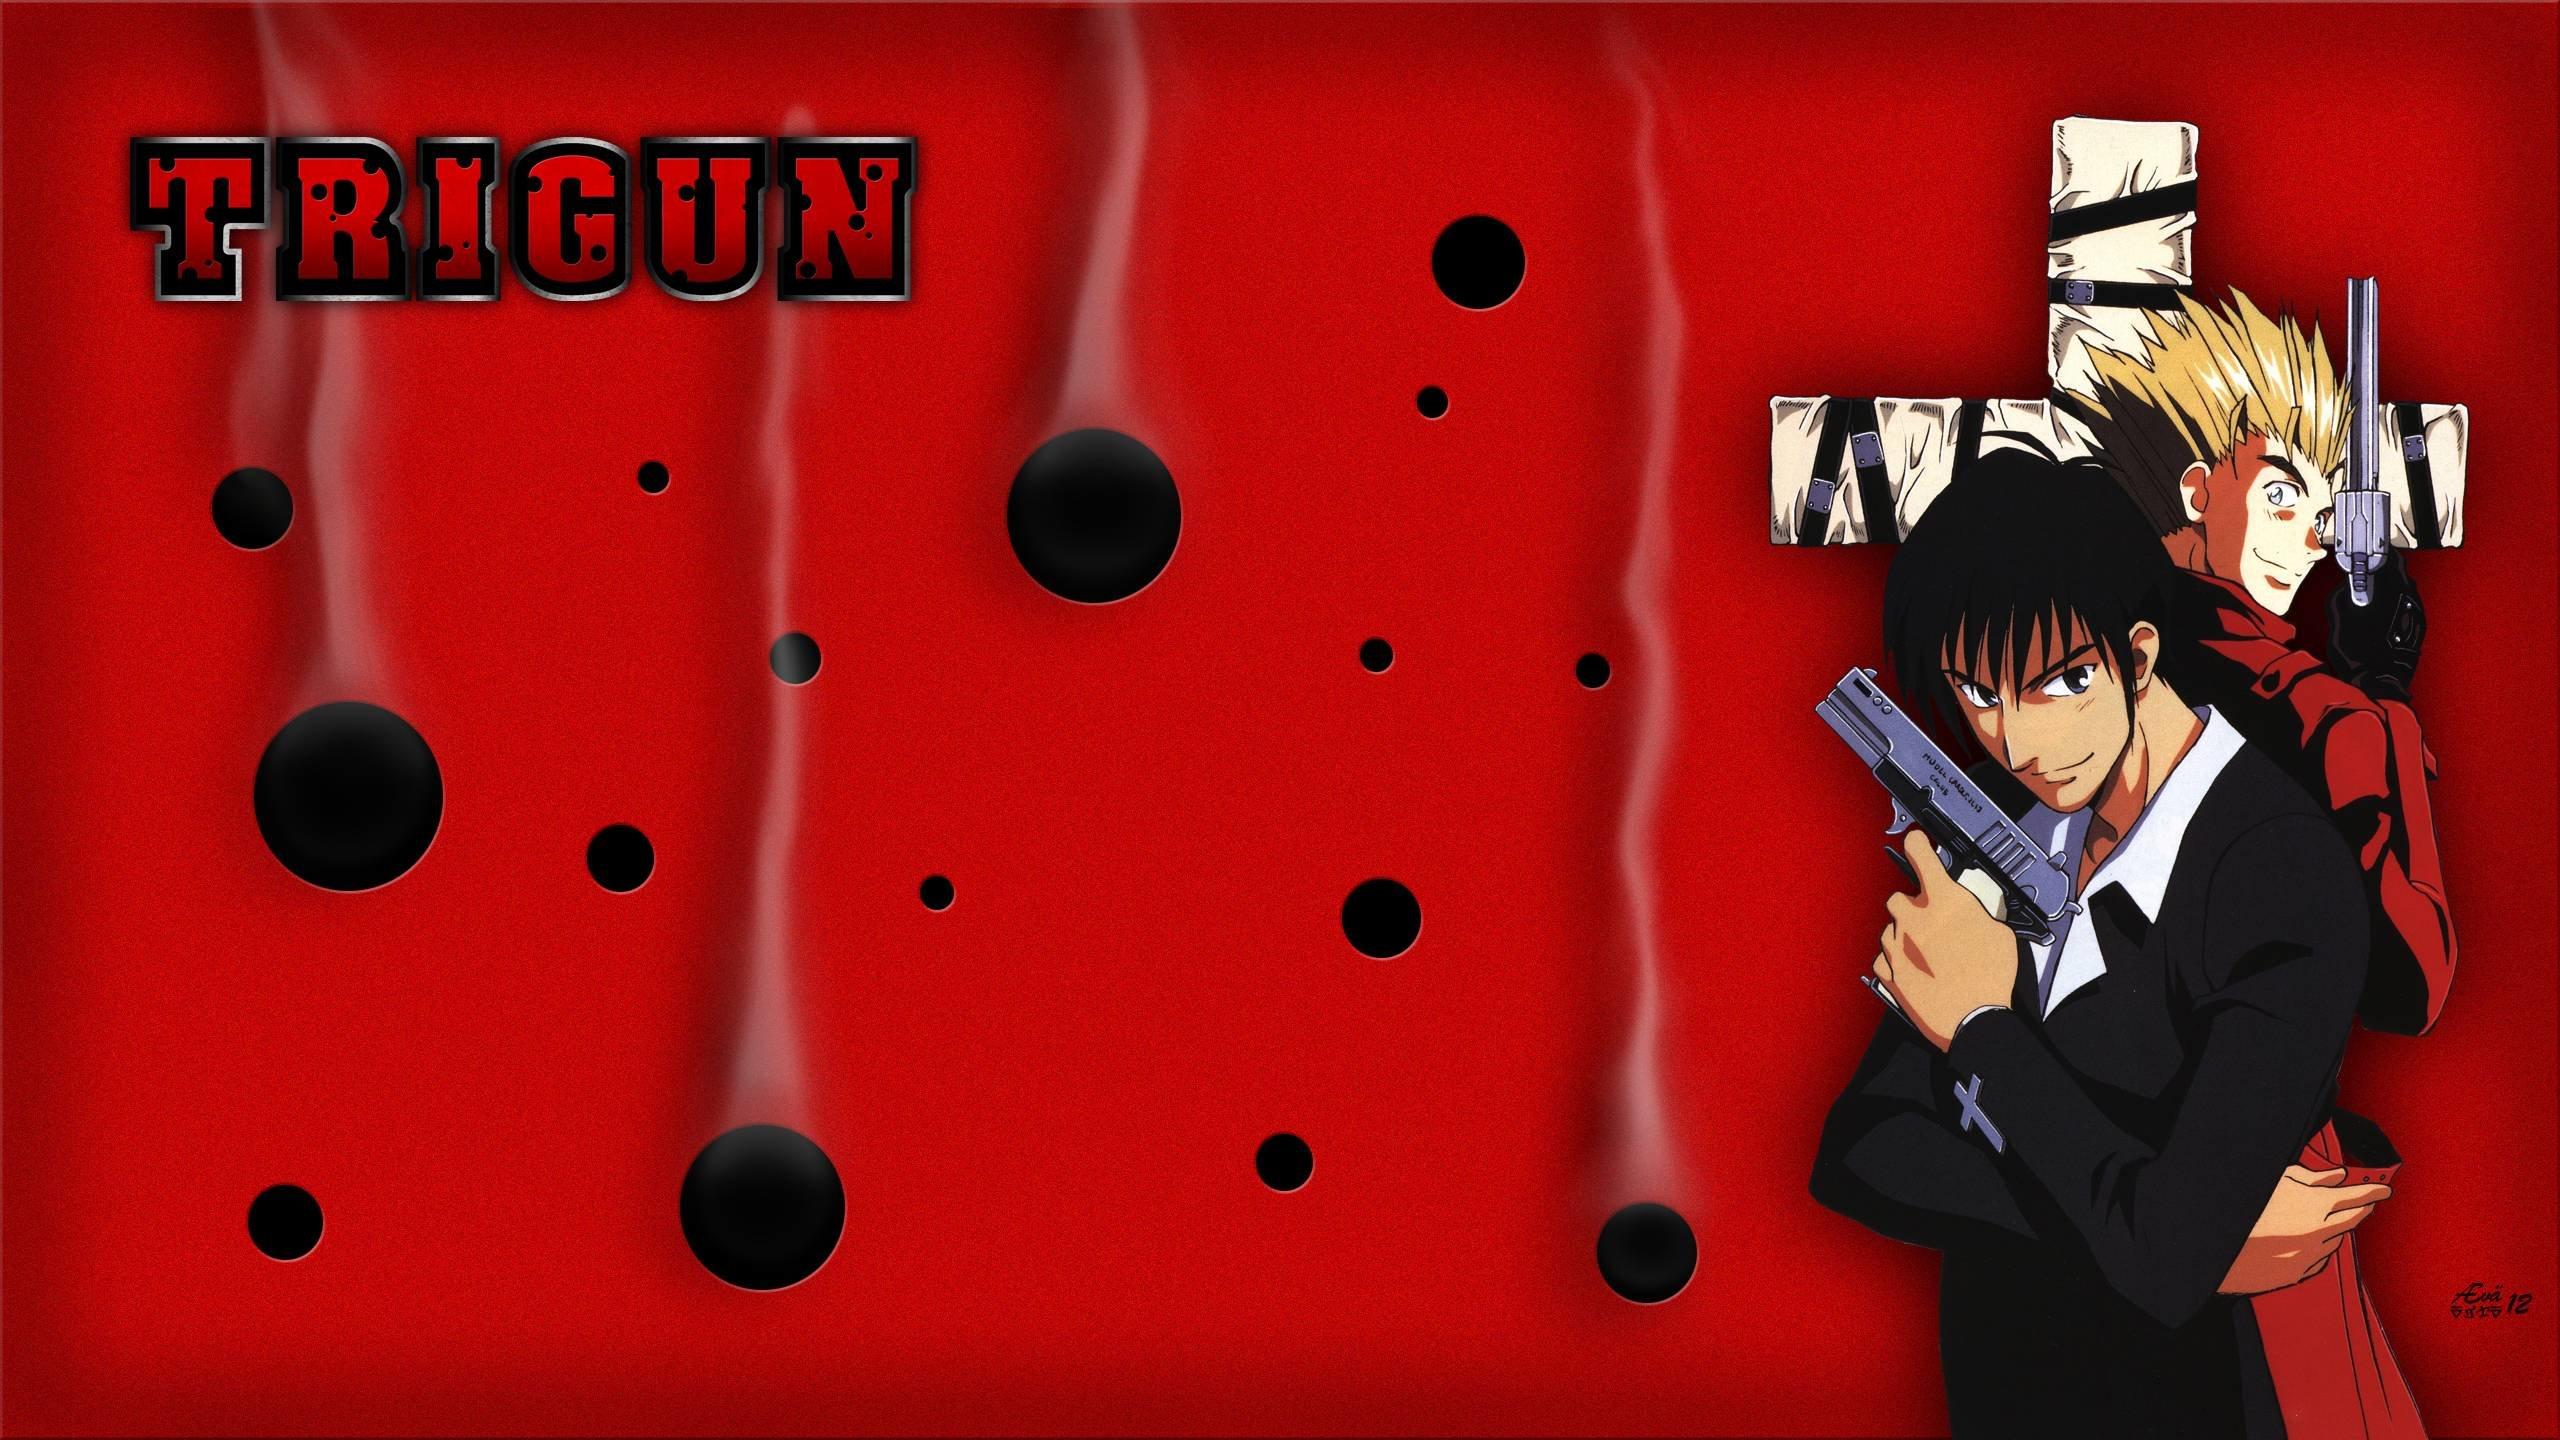 30+ Tri Gun Wallpaper Pictures